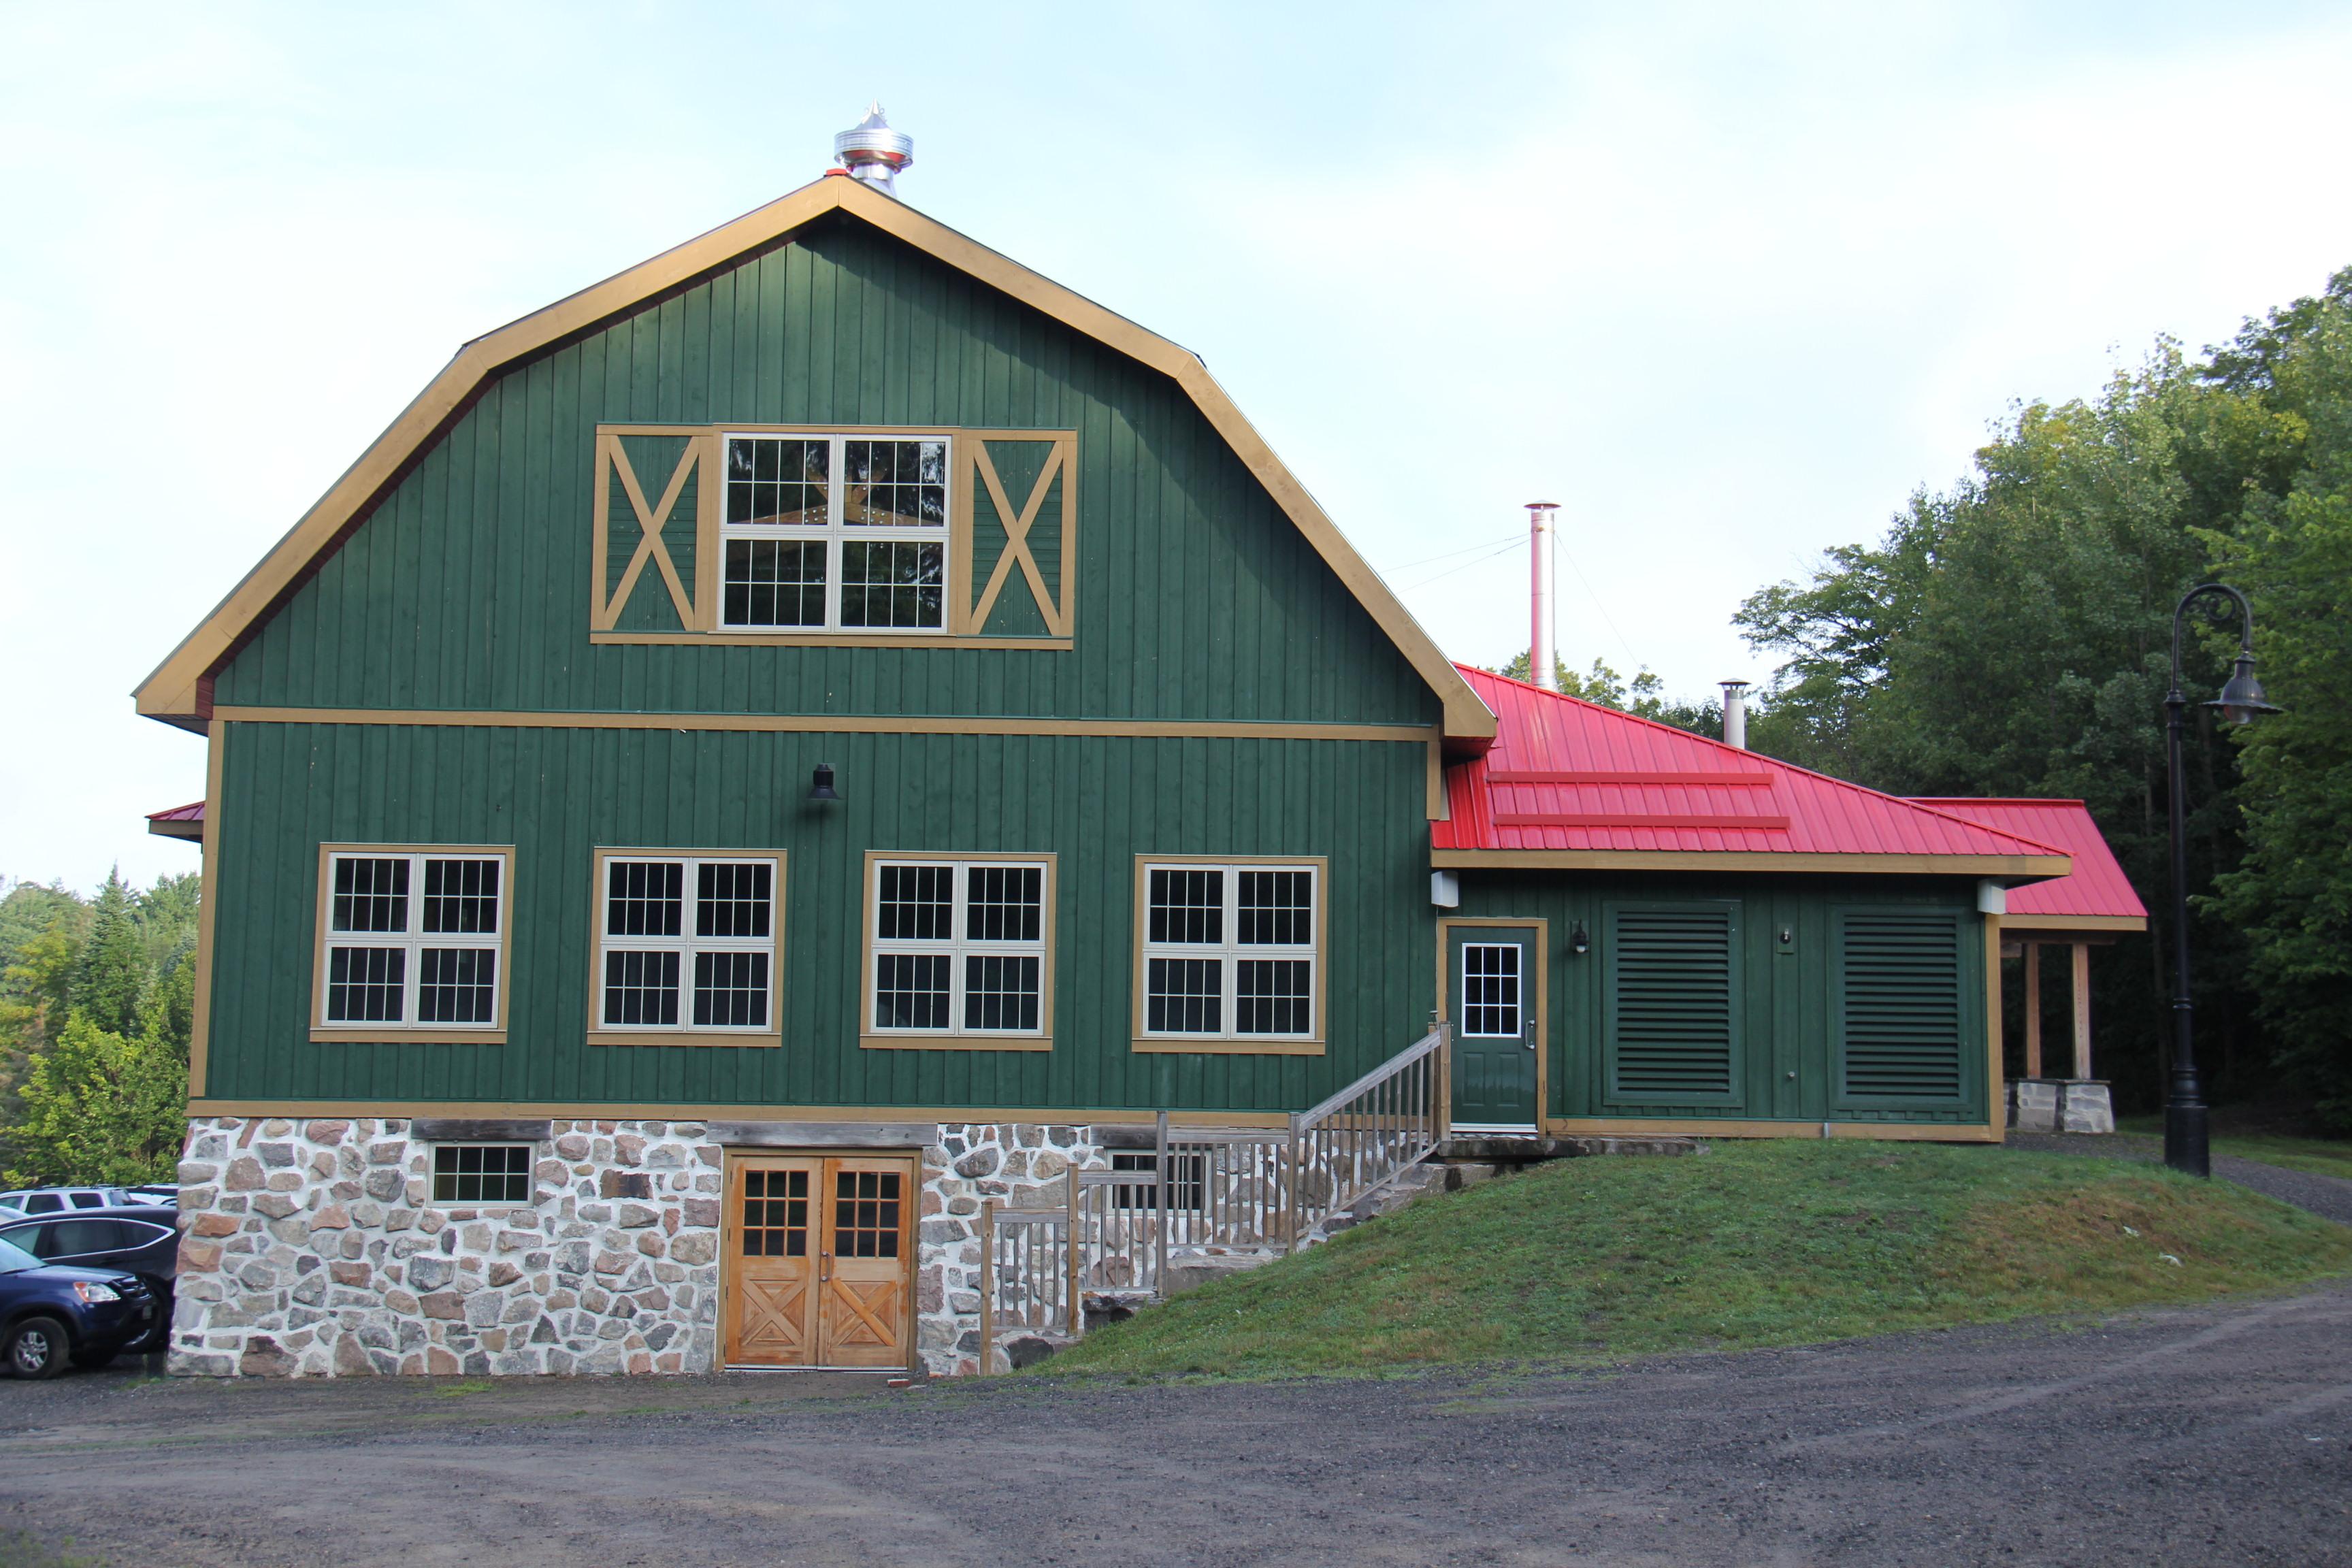 External view of The Barn at Ooch Muskoka